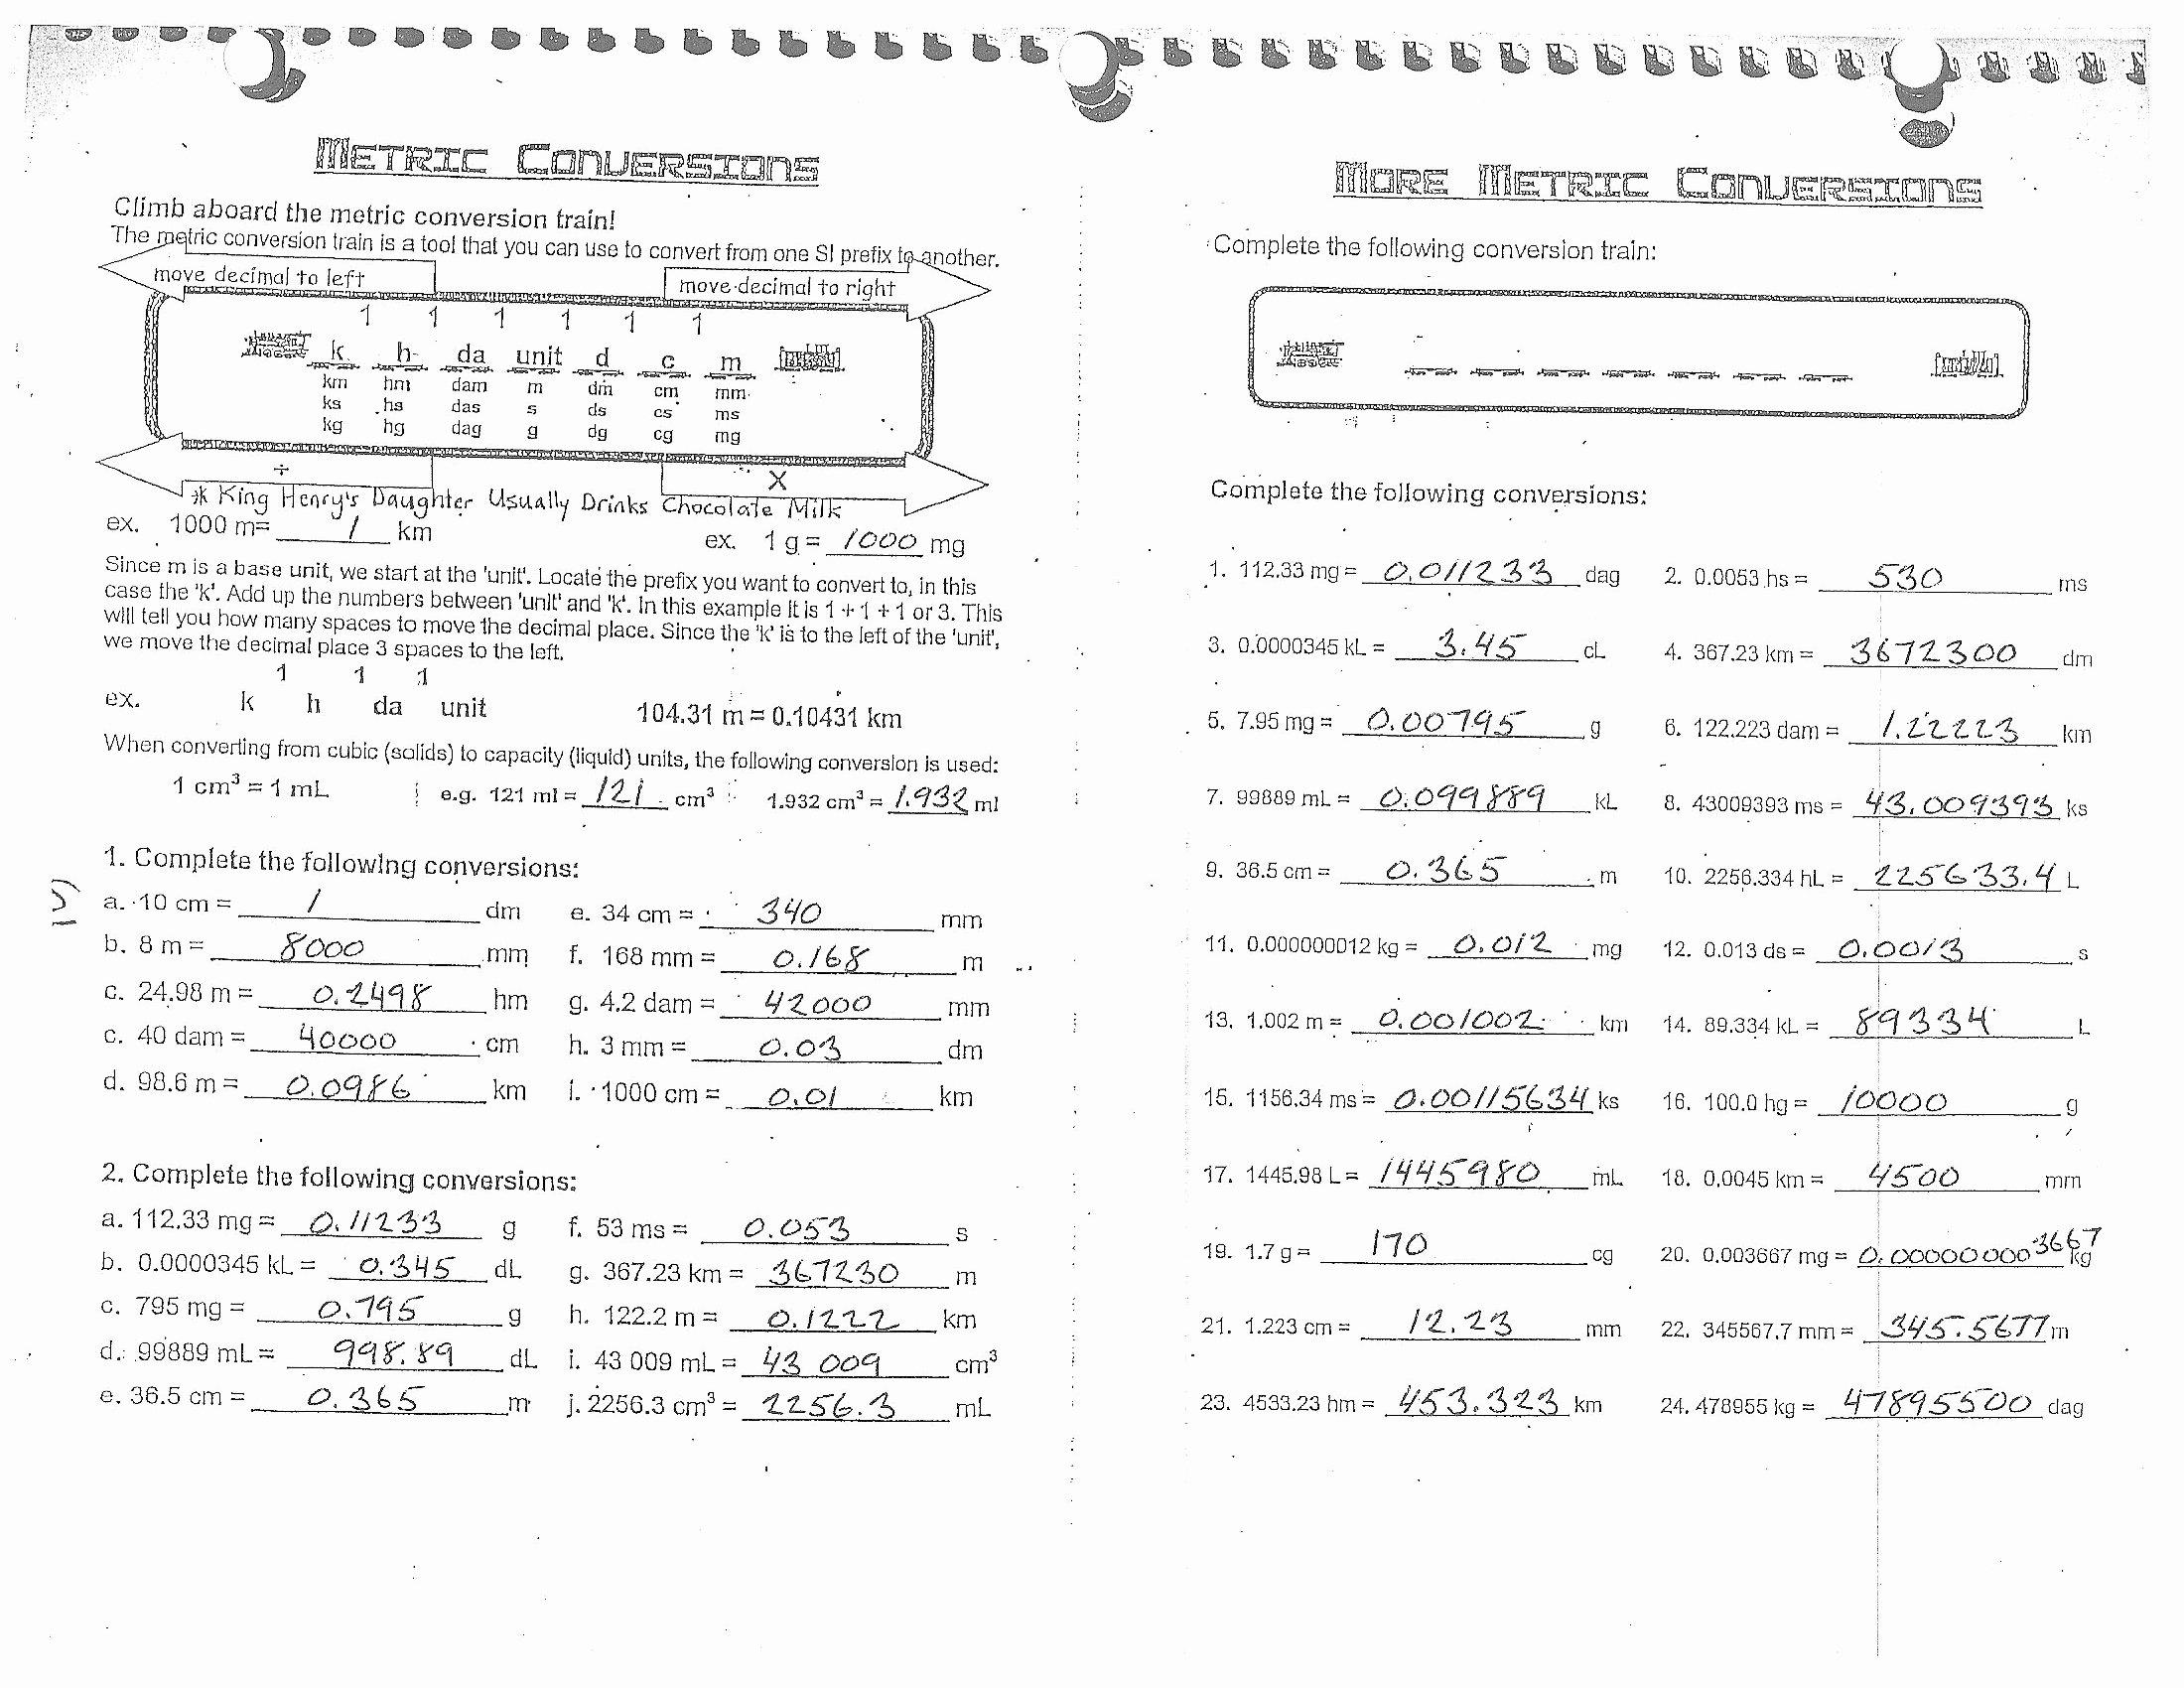 Unit Conversion Worksheet Answers Luxury Biology Worksheet Category Page 4 Worksheeto